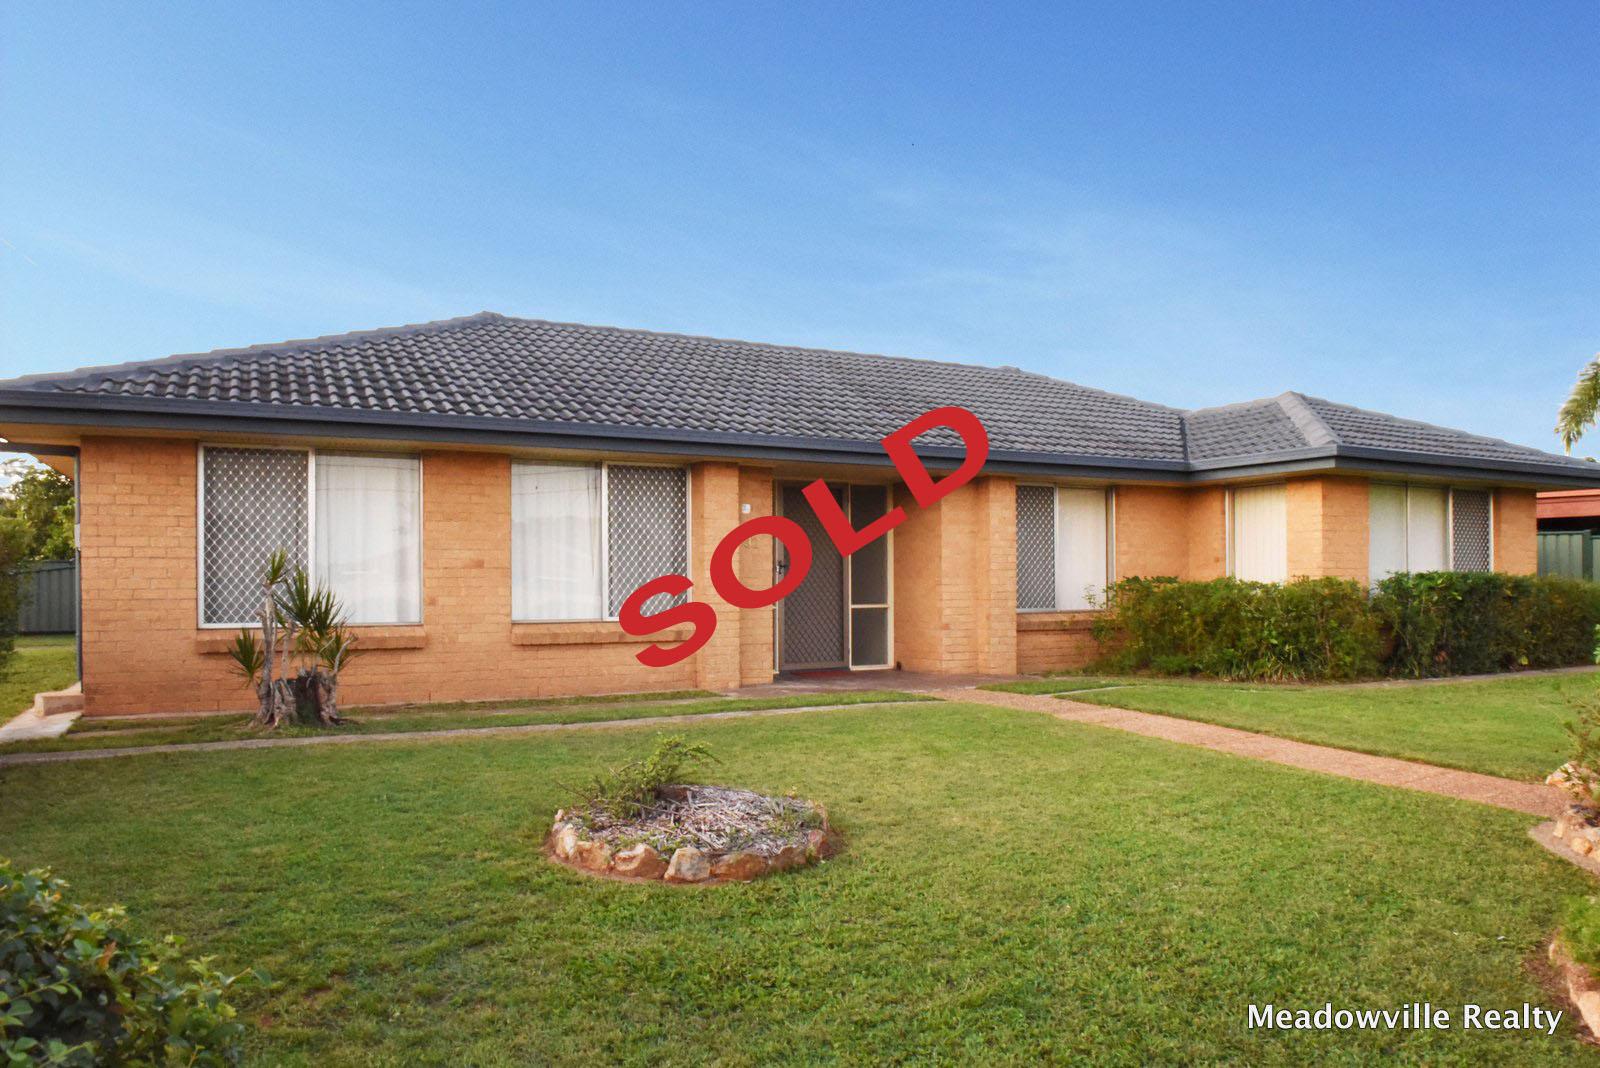 01 house - sold.jpg